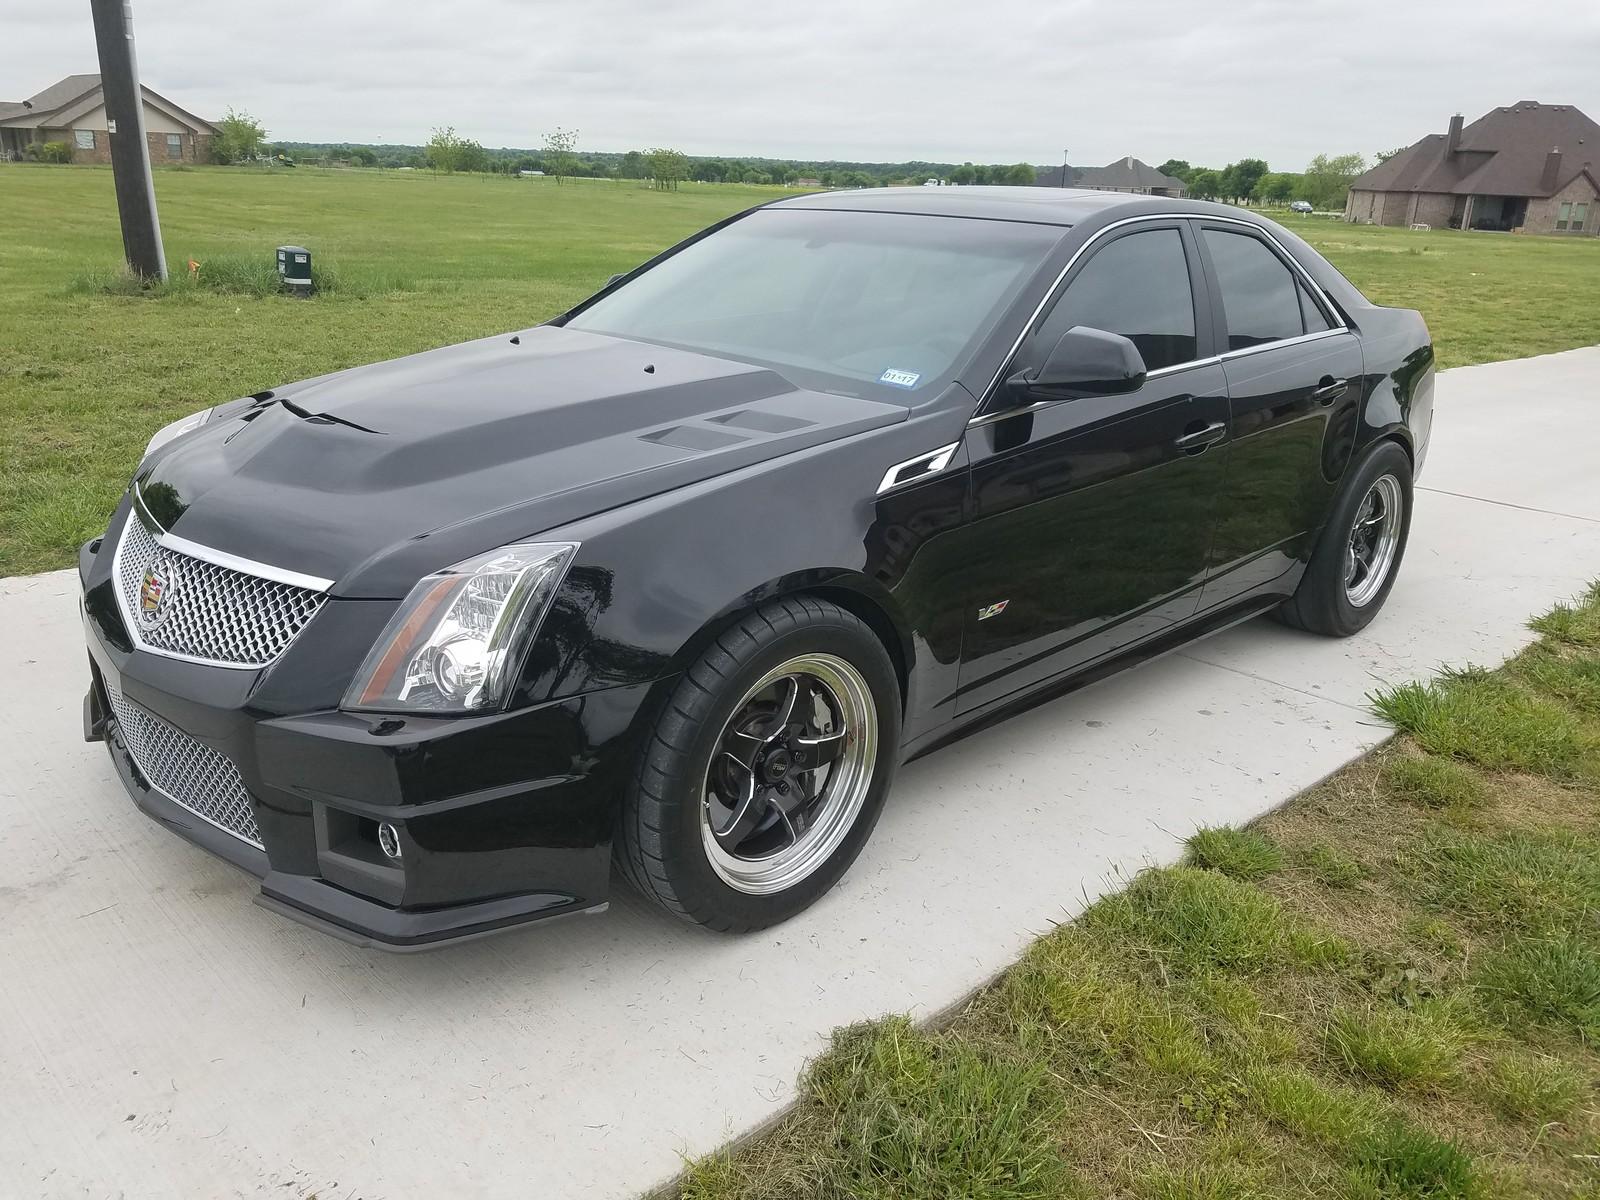 2012 Black Raven Cadillac Cts V Sedan Pictures Mods